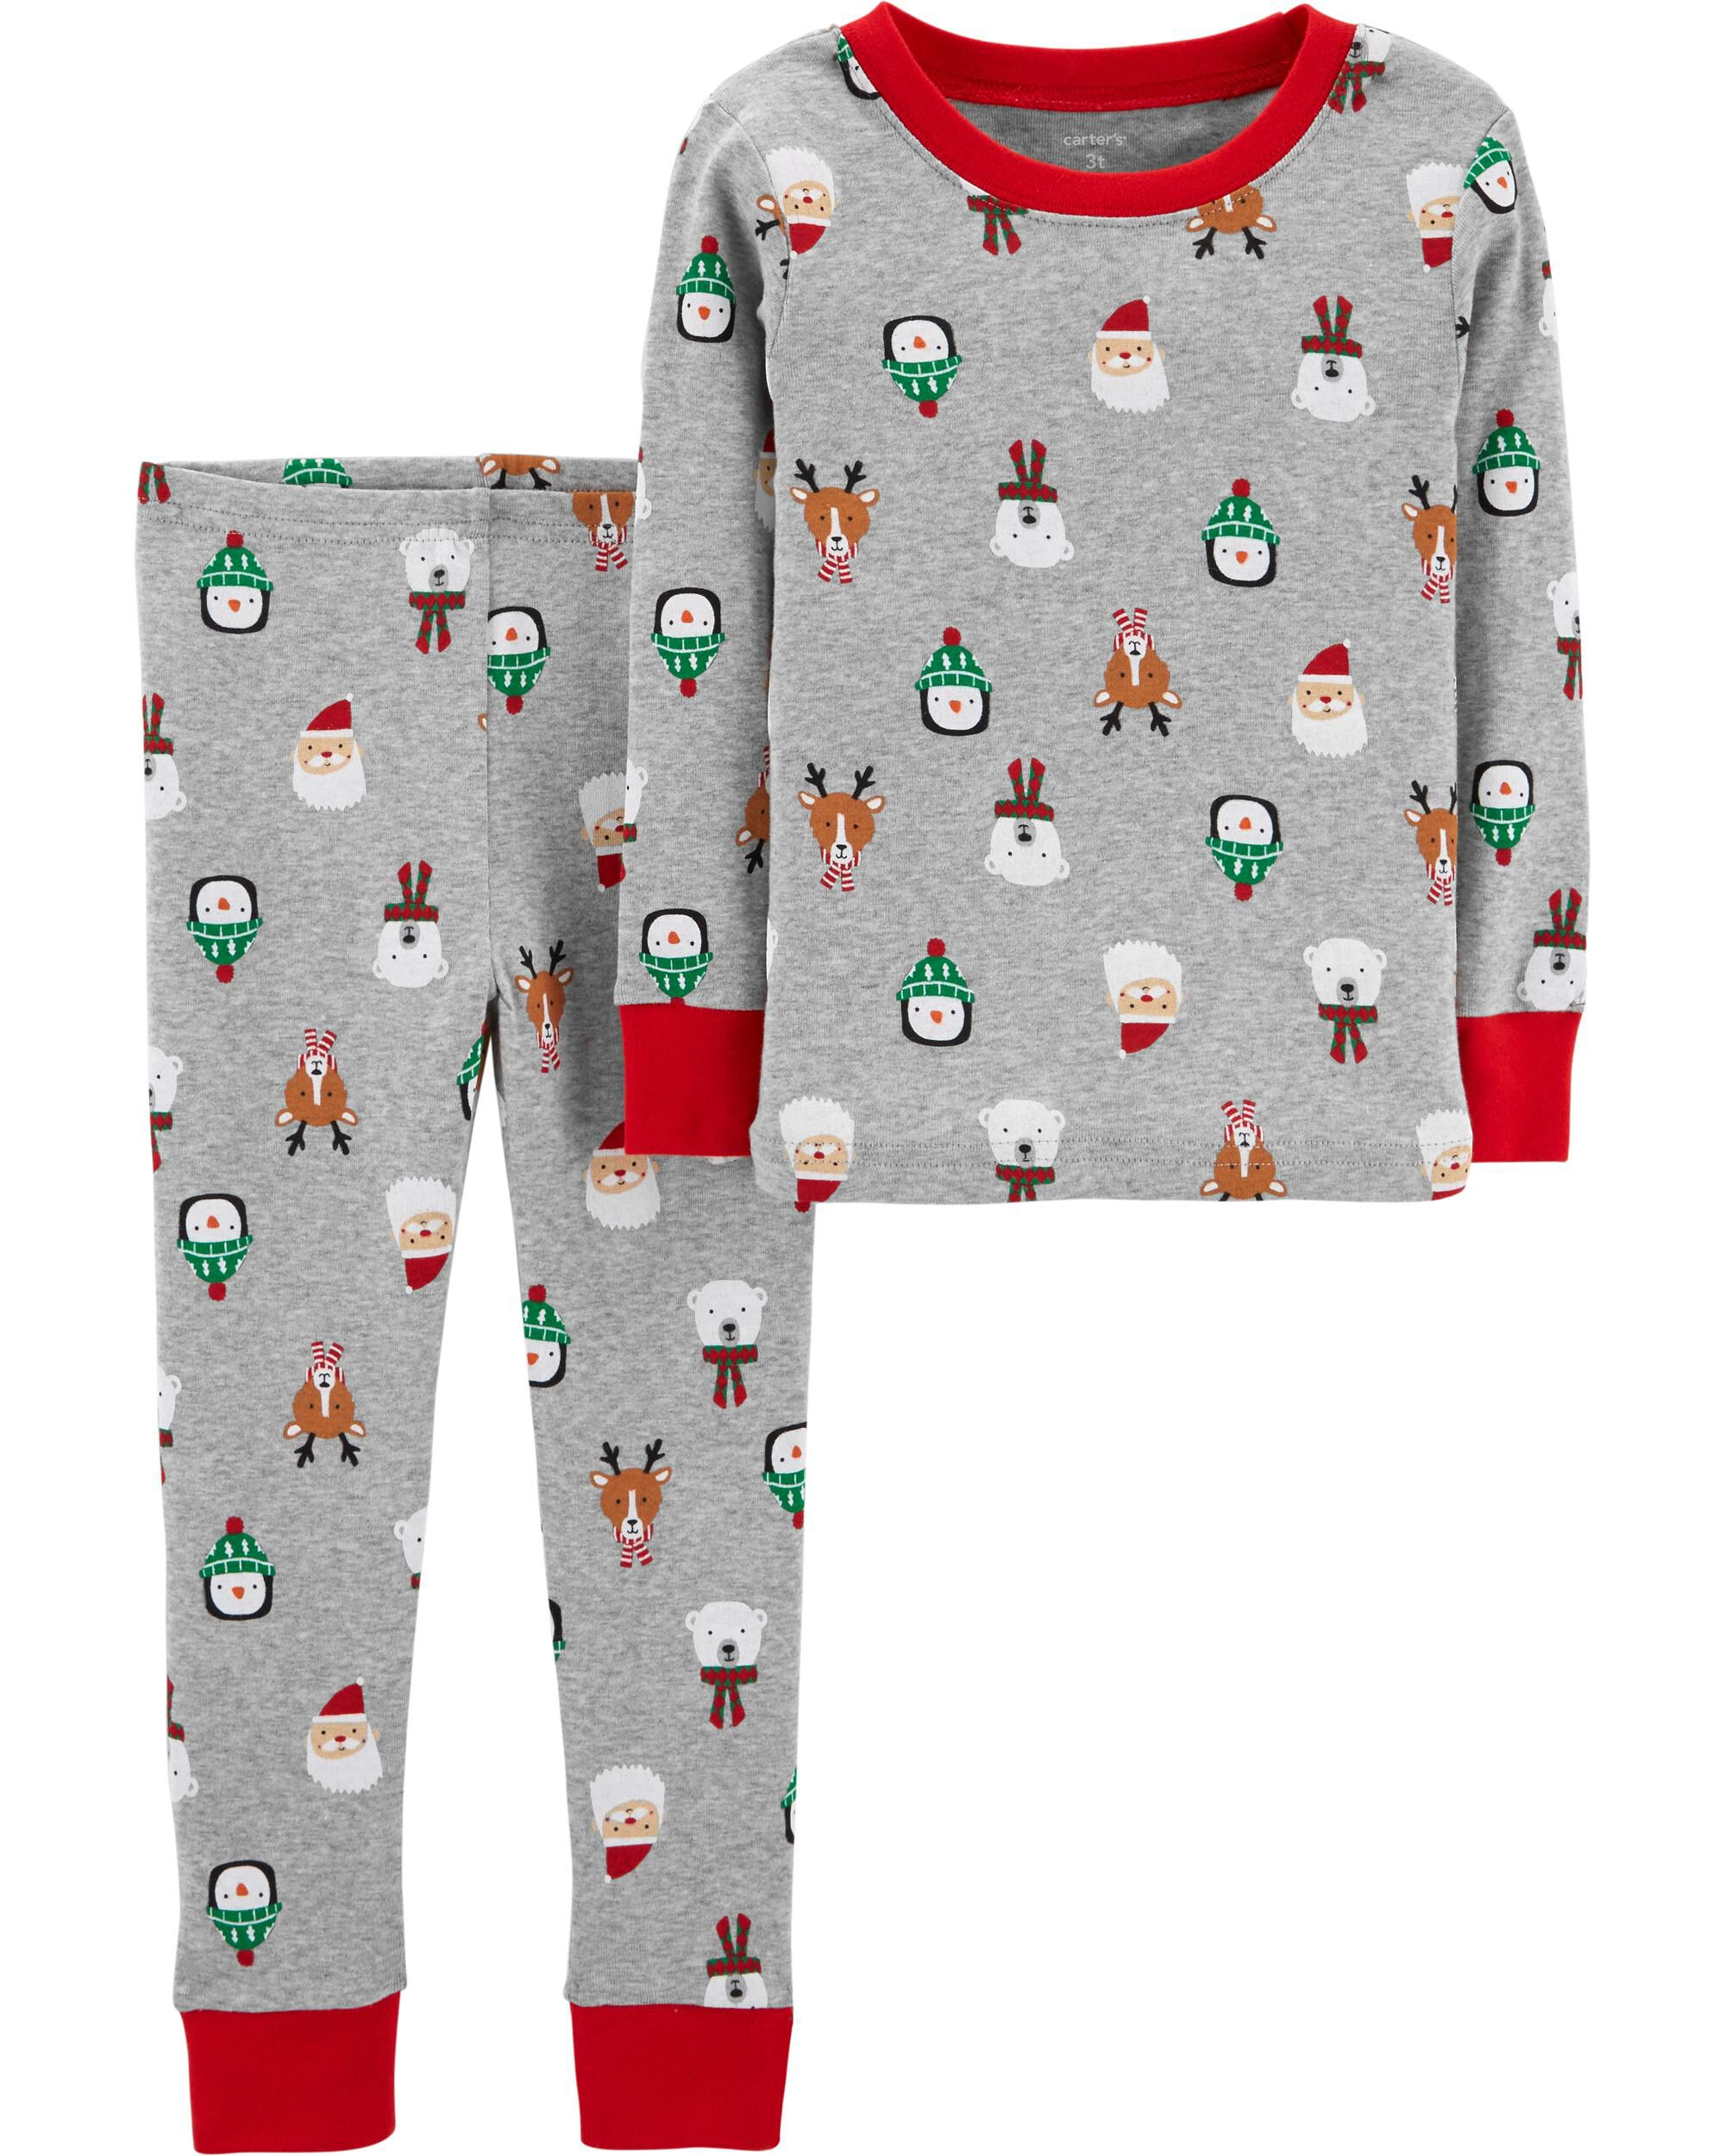 2-Piece Baby Christmas Snug Fit Cotton PJs | Carters.com